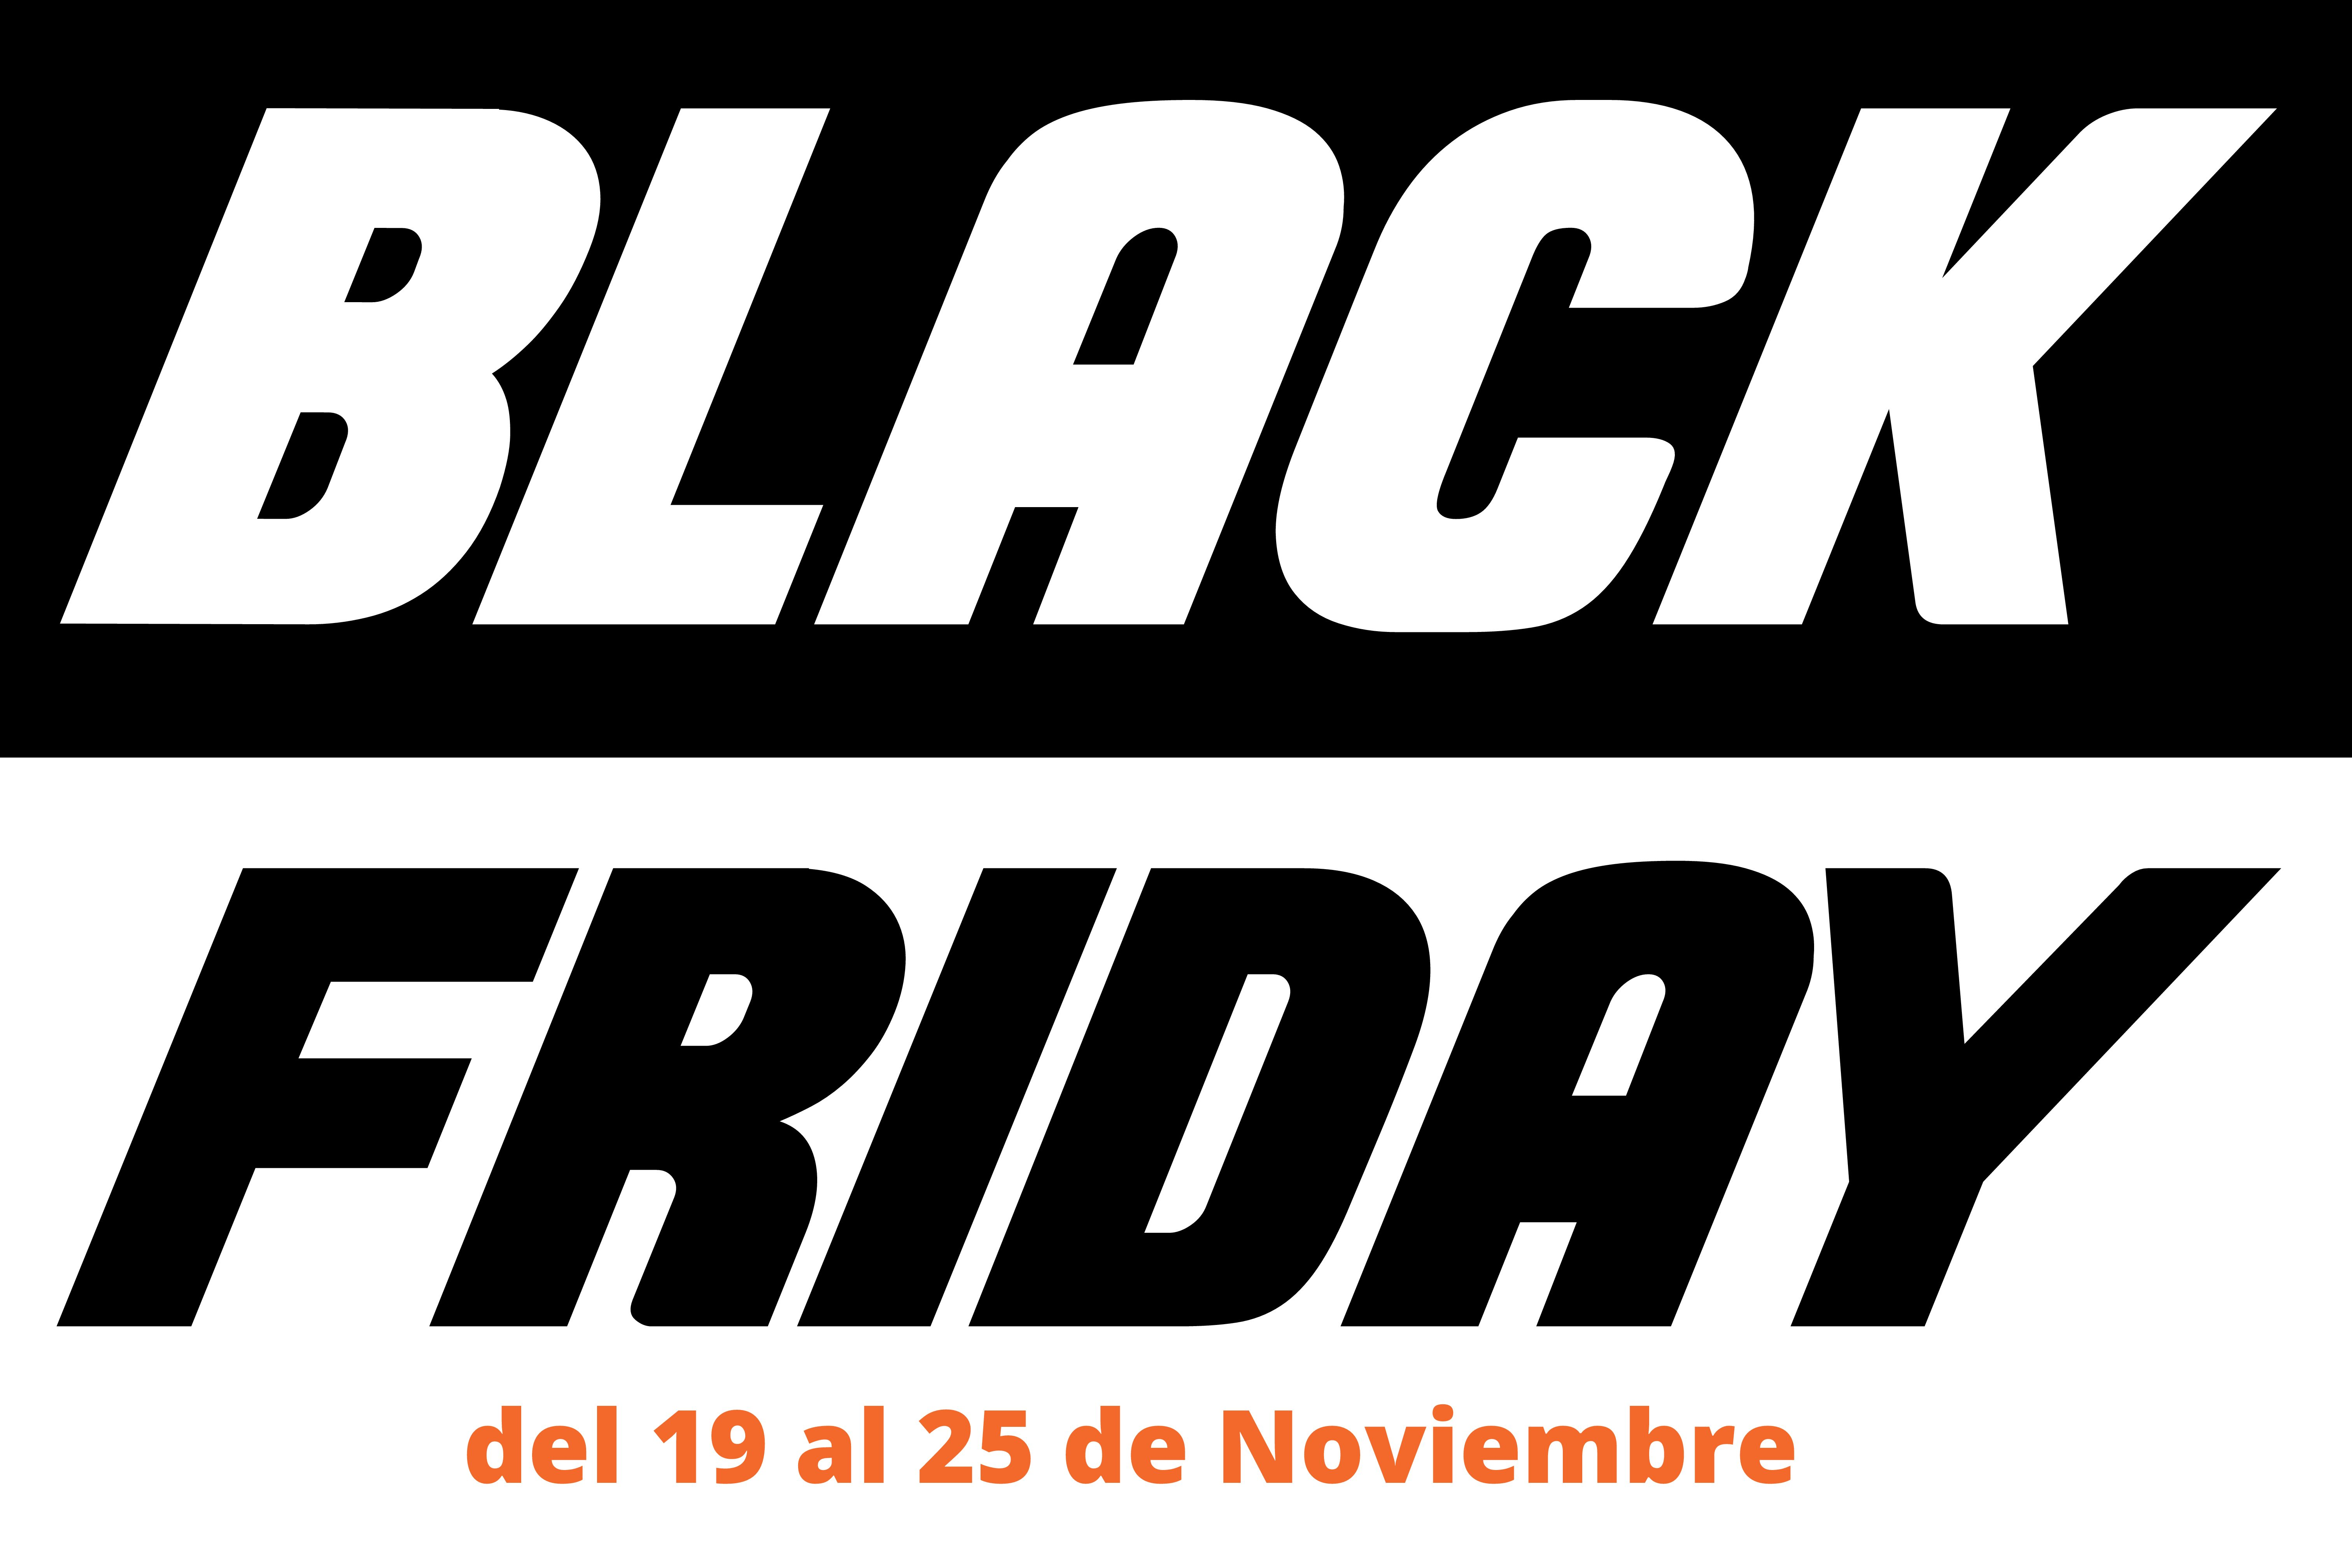 Black Friday electrodomésticos 2018